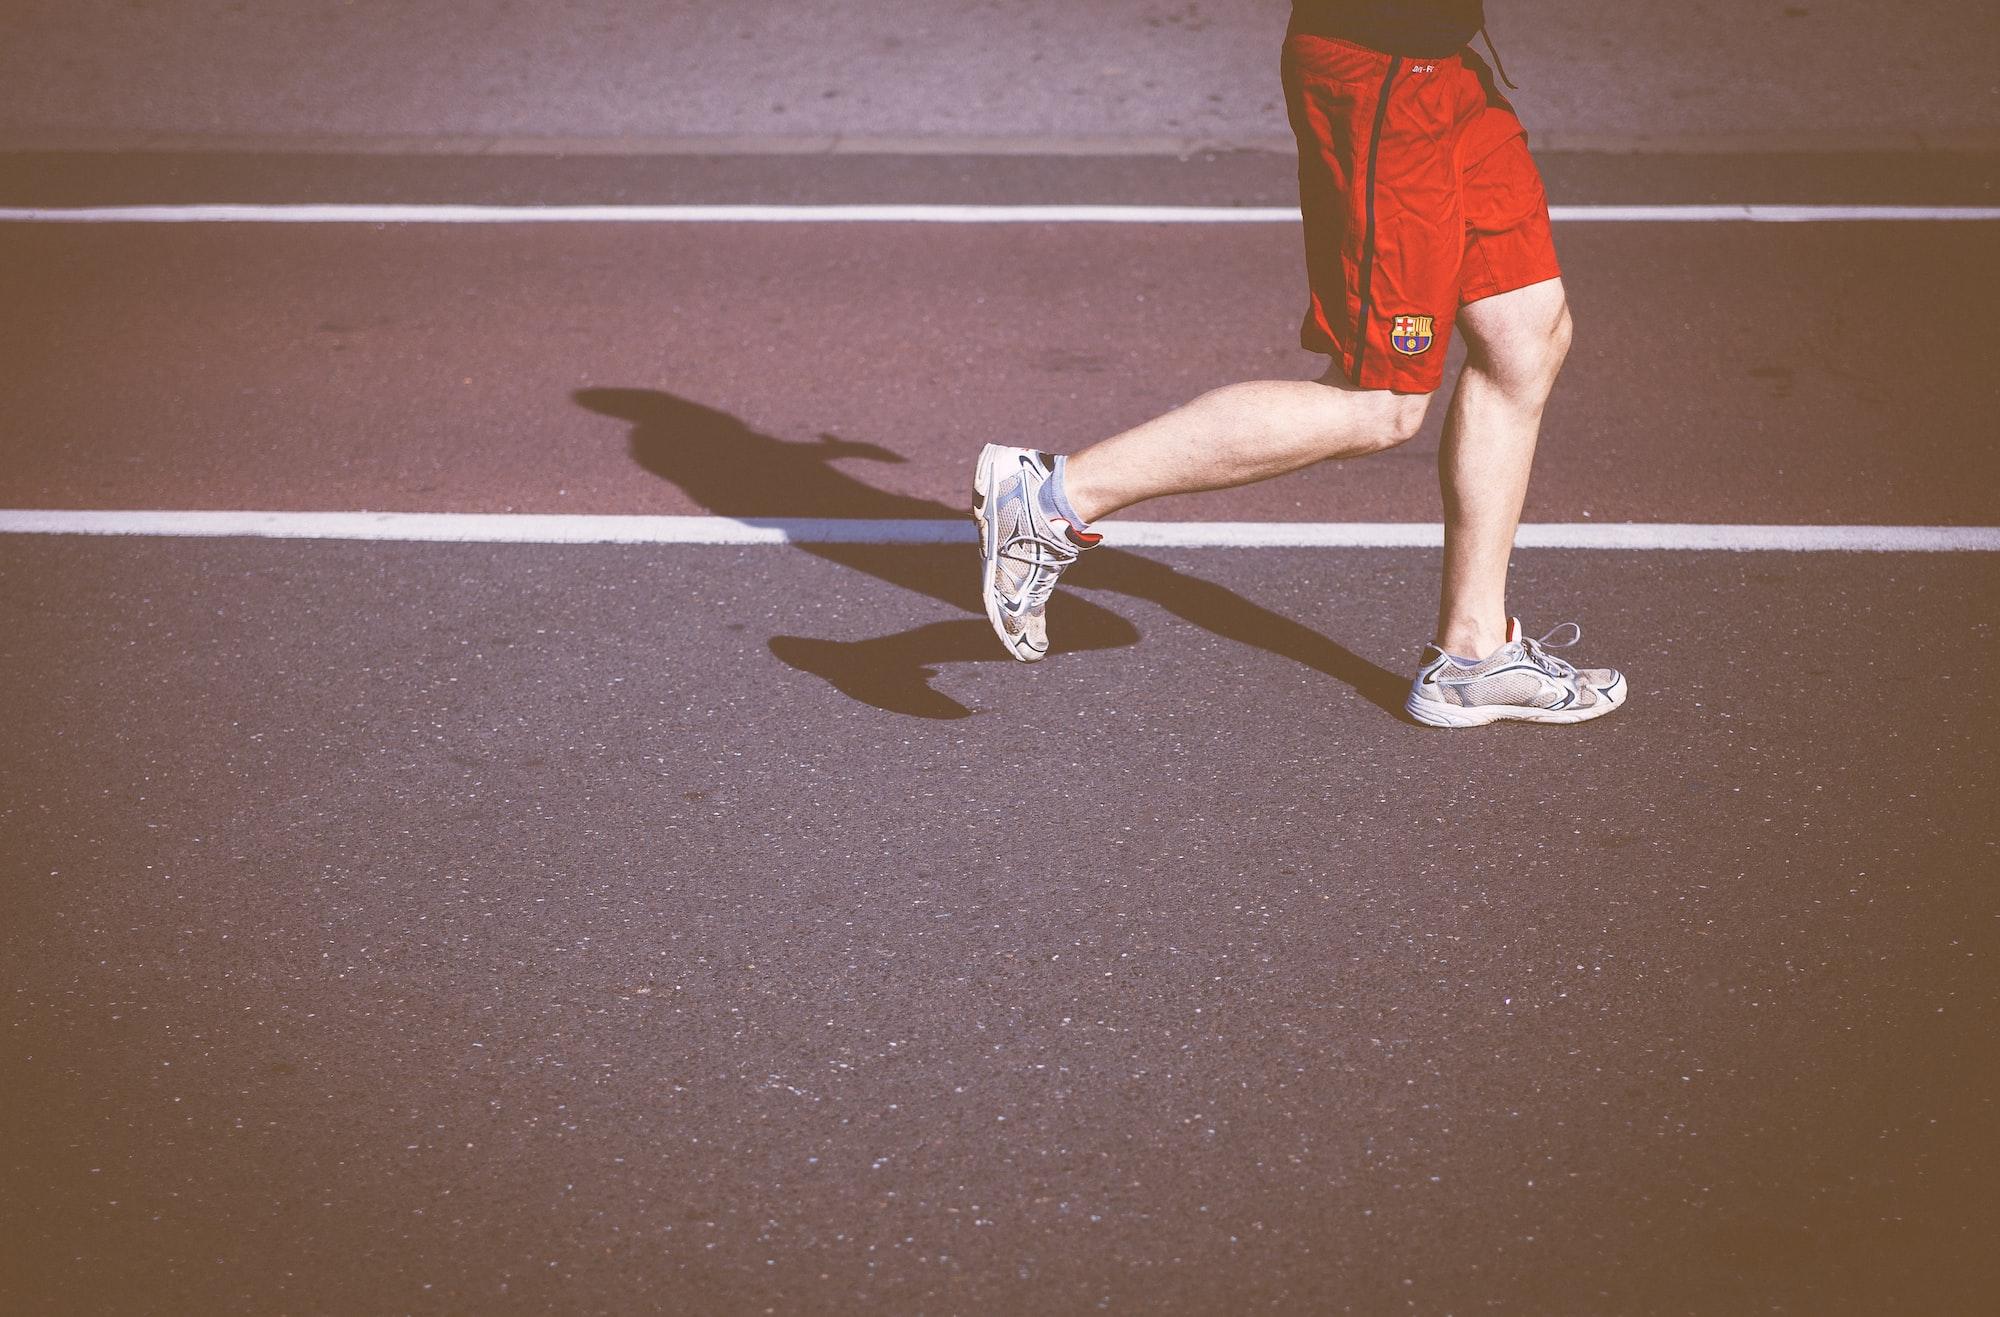 Man running to improve post-Christmas health